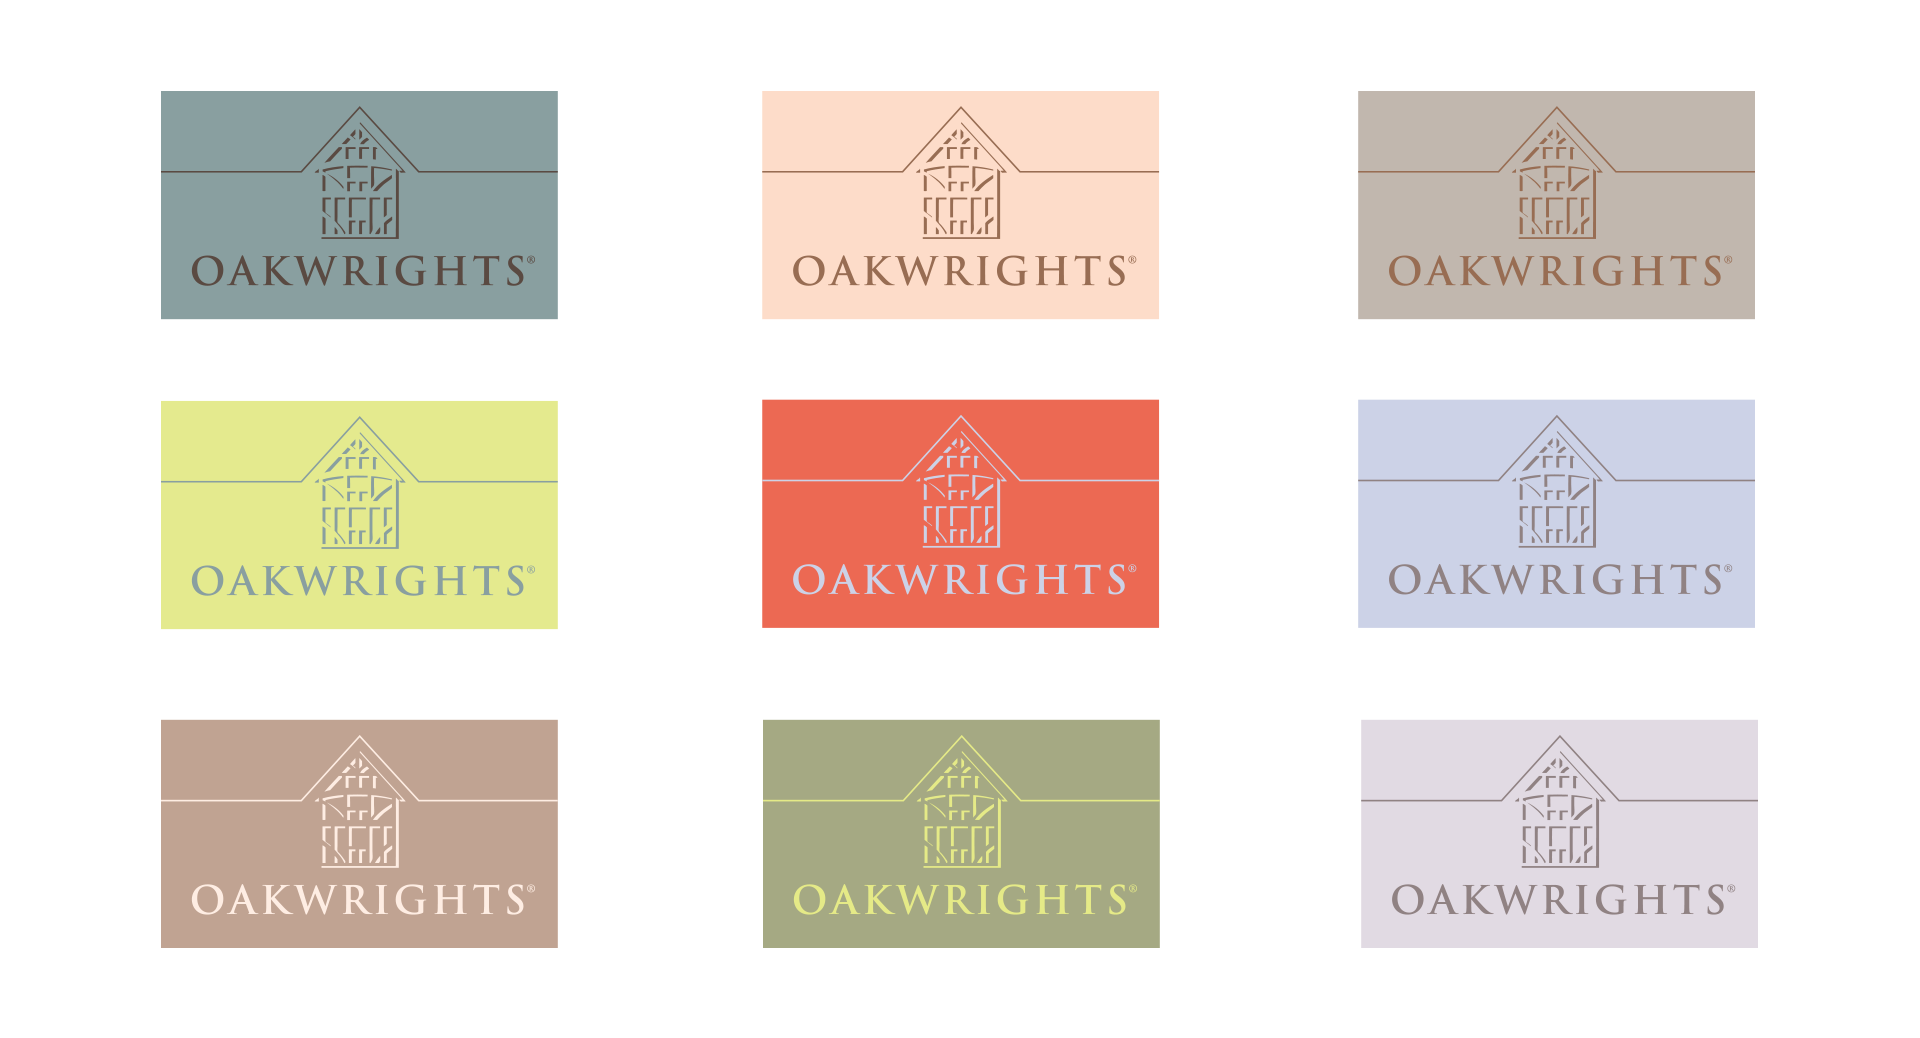 oakwrights brand